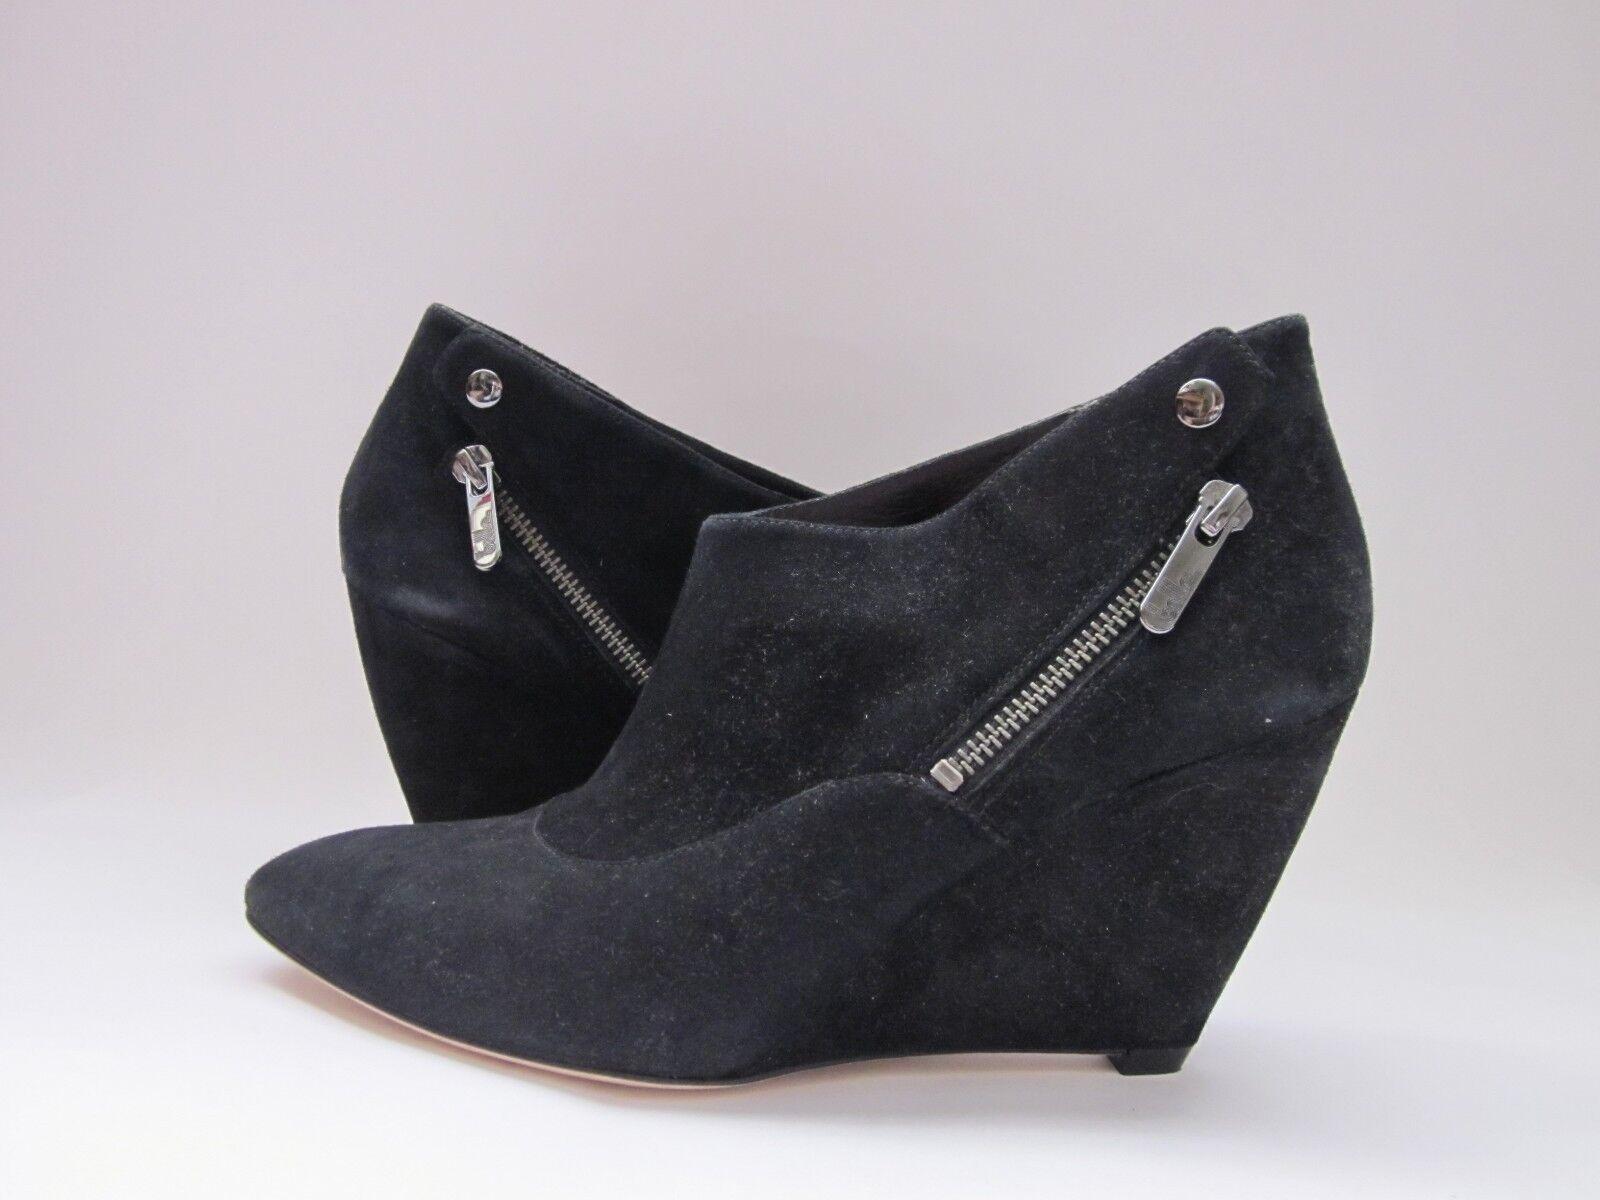 Belle by Sigerson Morrison Frankie Black Suede Fashion Ankle Bootie Women's 9 M